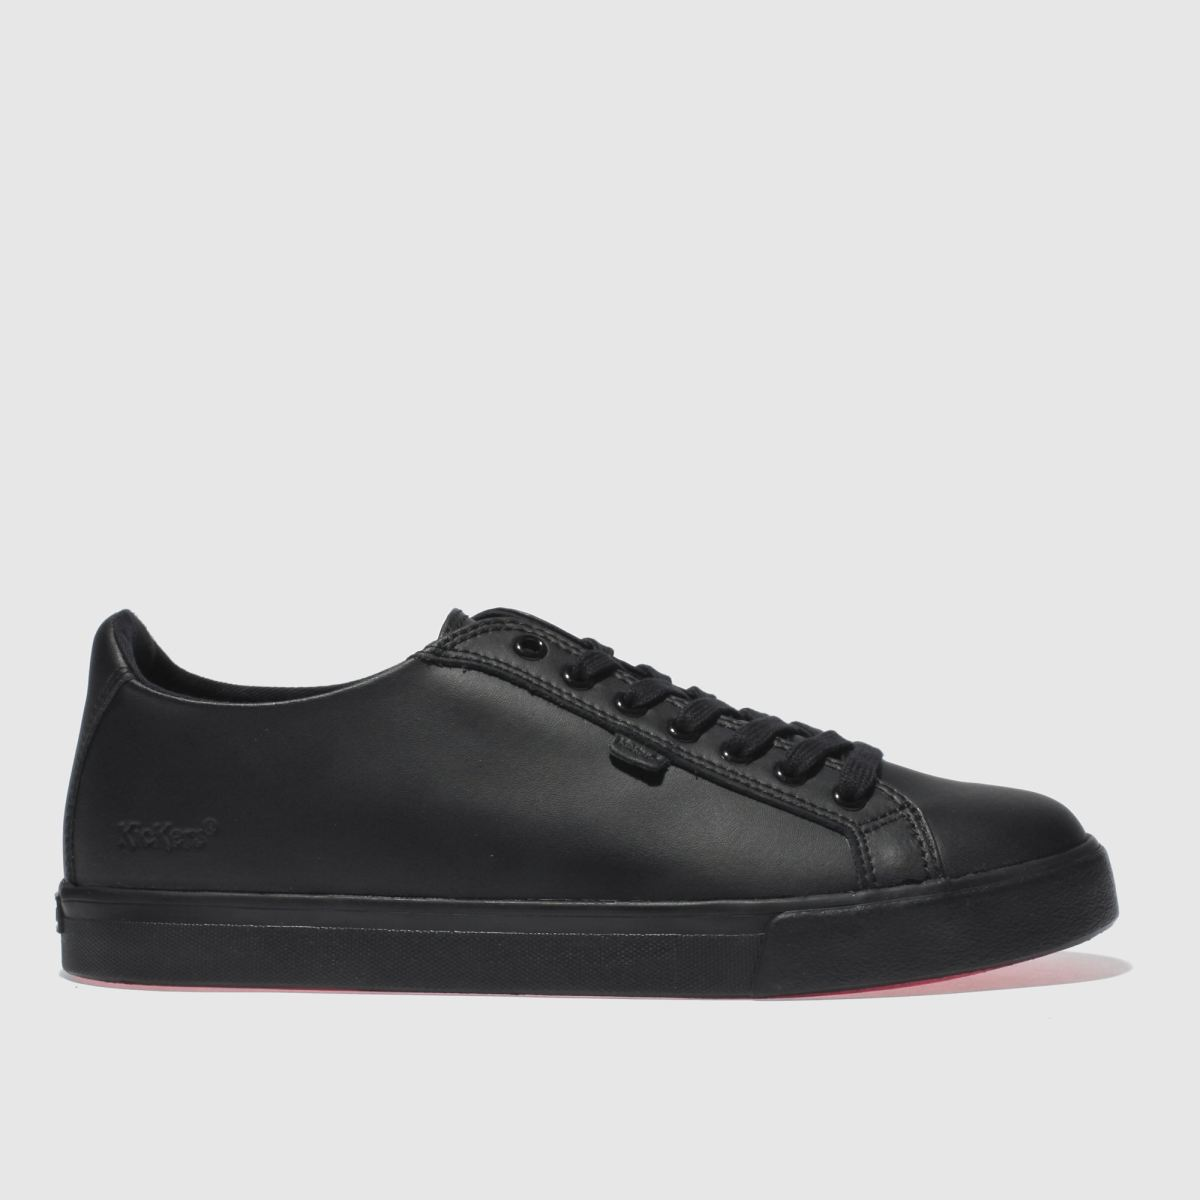 Kickers Black Tovni Lacer Flat Shoes